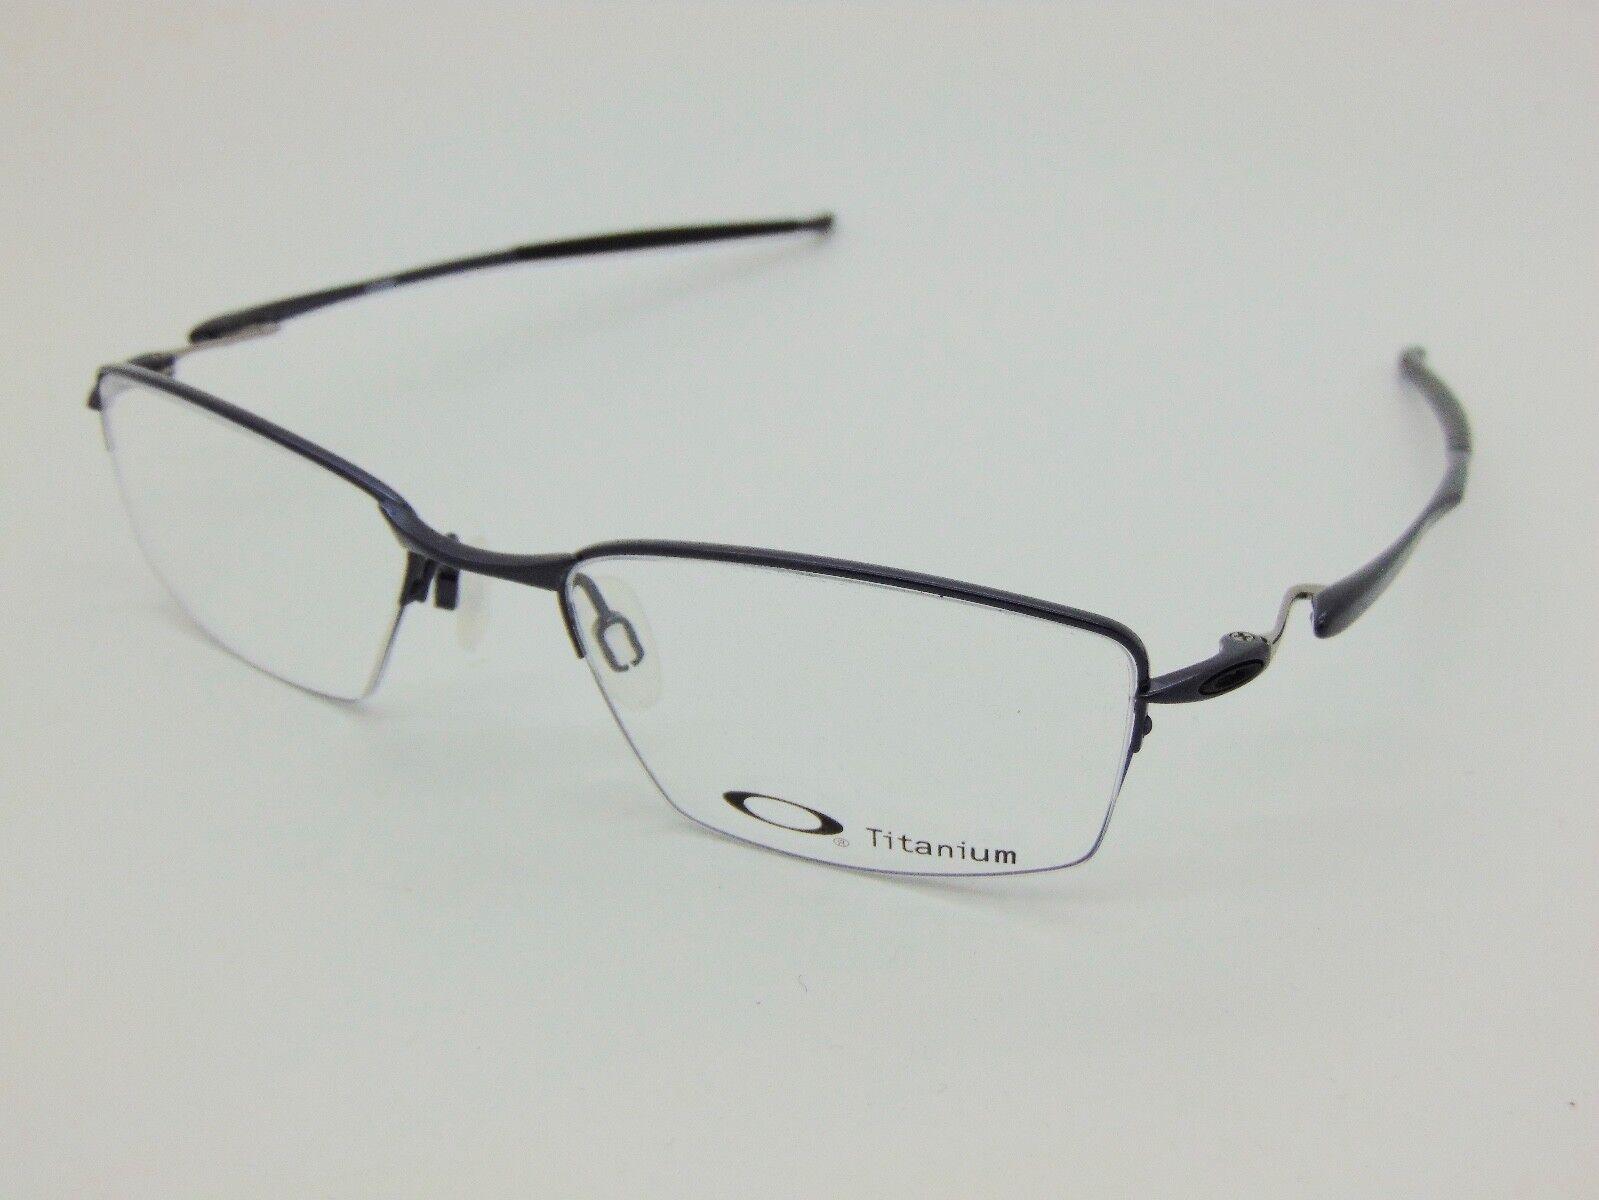 a20369ebd8 Oakley 0ox5113 Lizard Semi Rim Rectangular Eyeglasses for Unisex ...